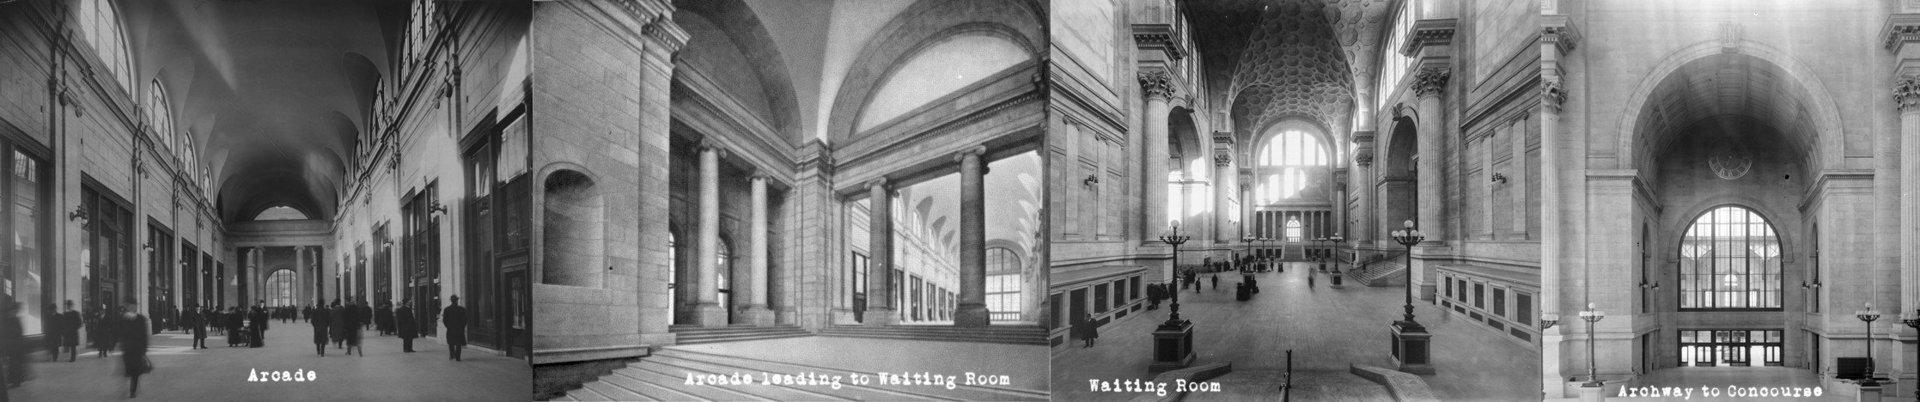 Penn_Station_collage.jpg